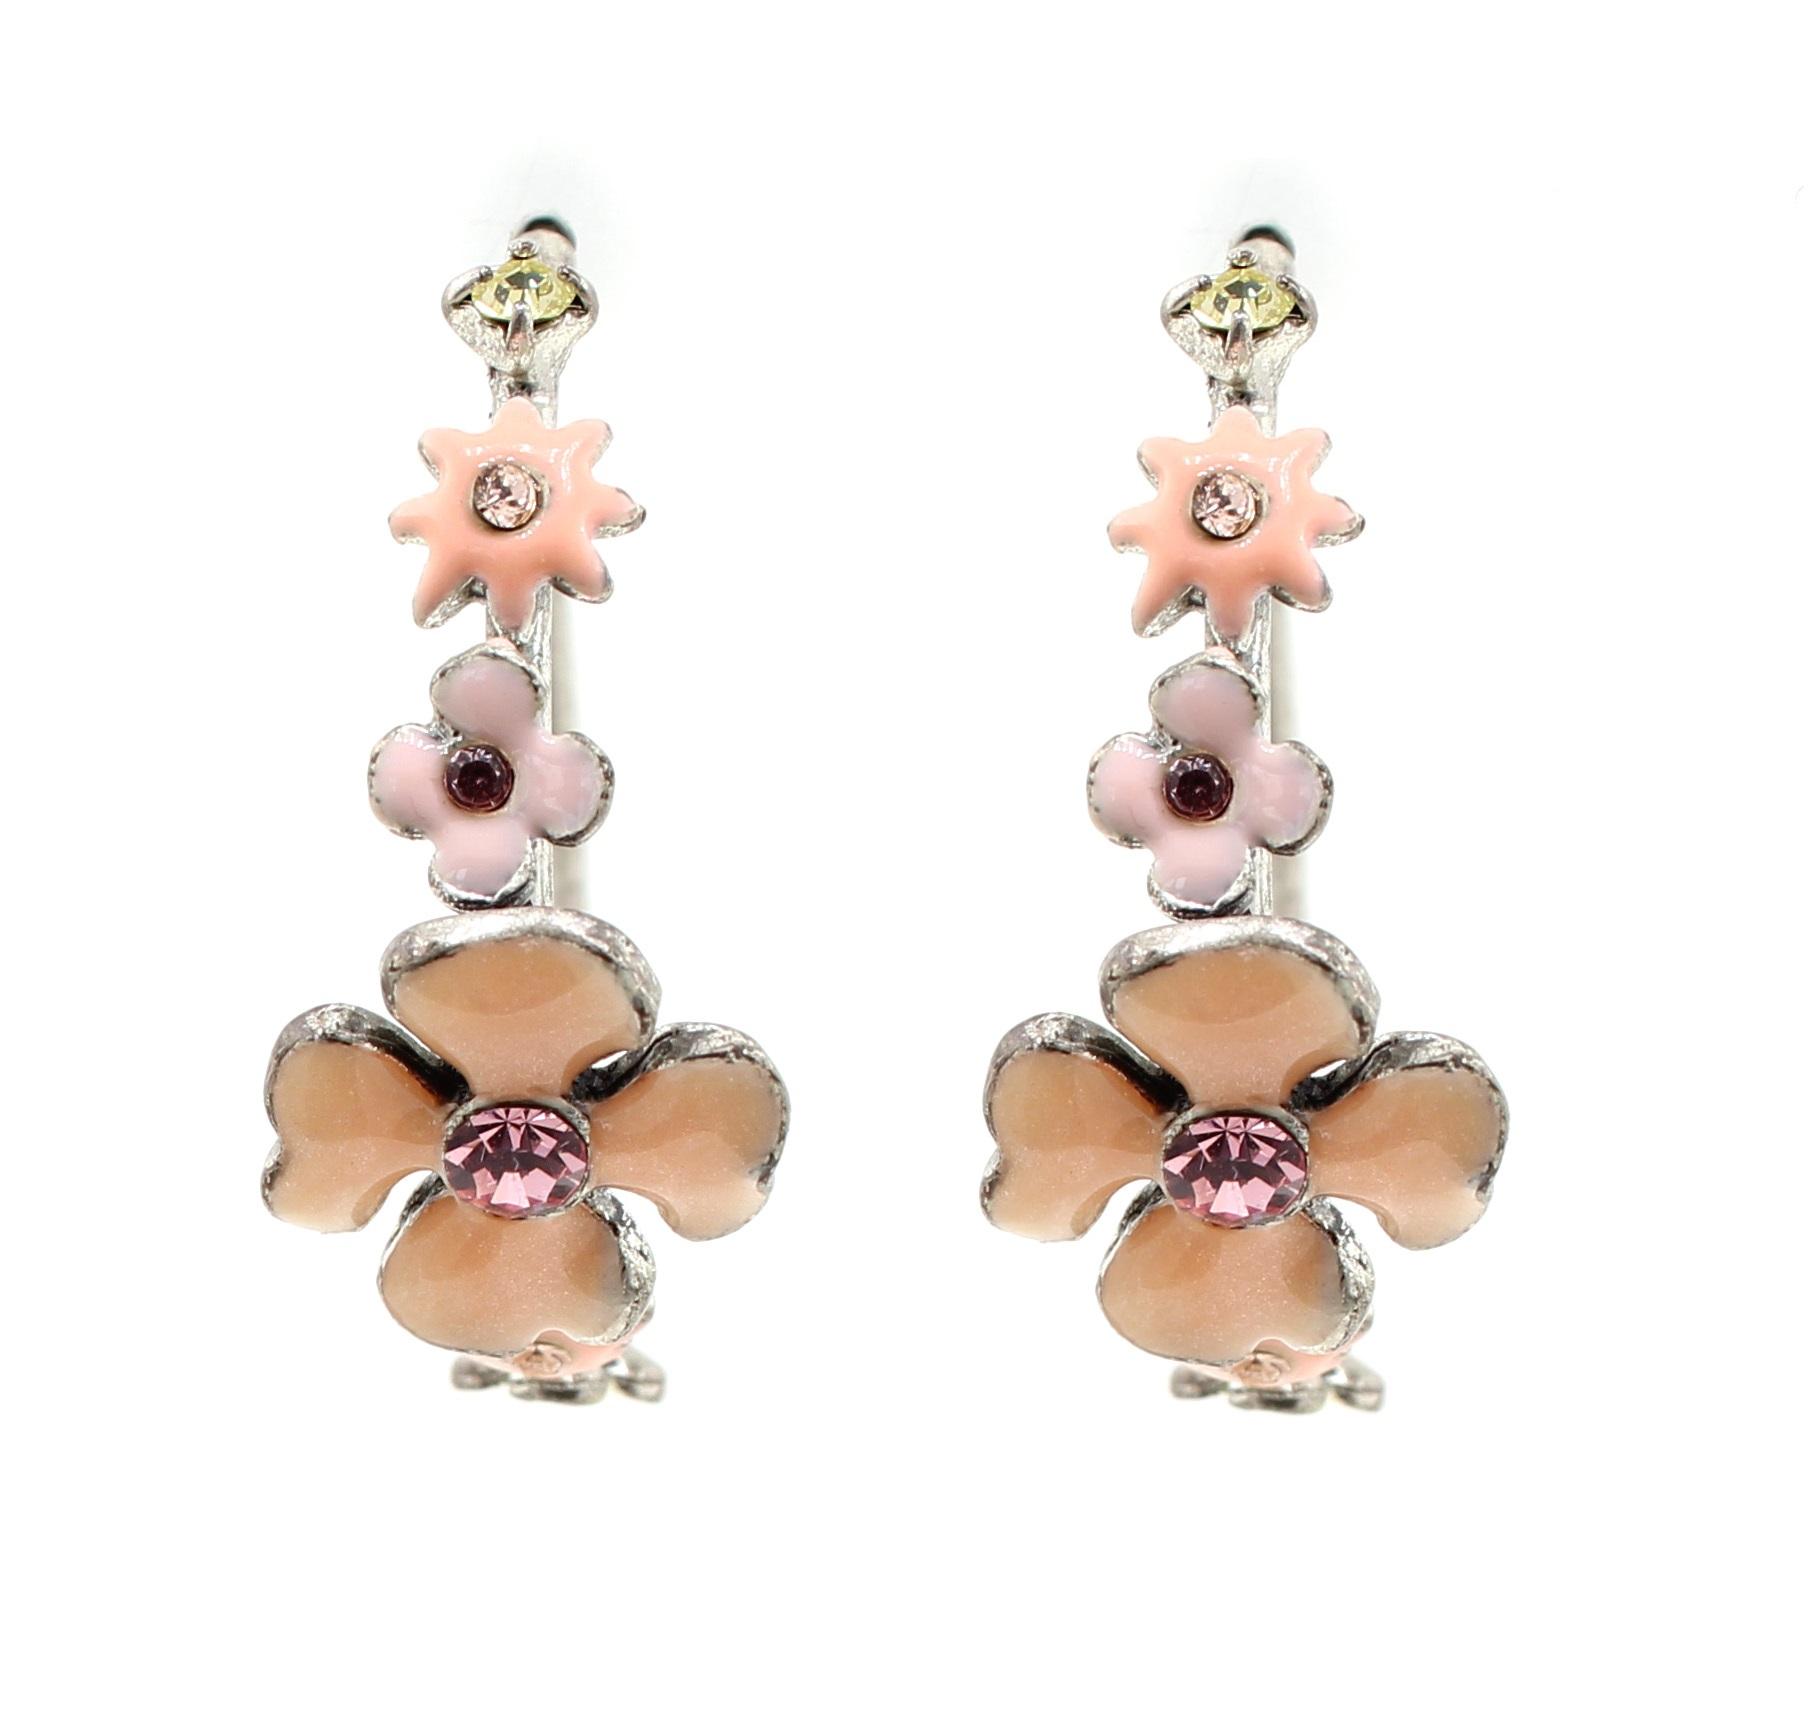 PILGRIM - Daisy - Hoop Earrings - Oxidised Silver Plate/Pink & Yellow BNWT